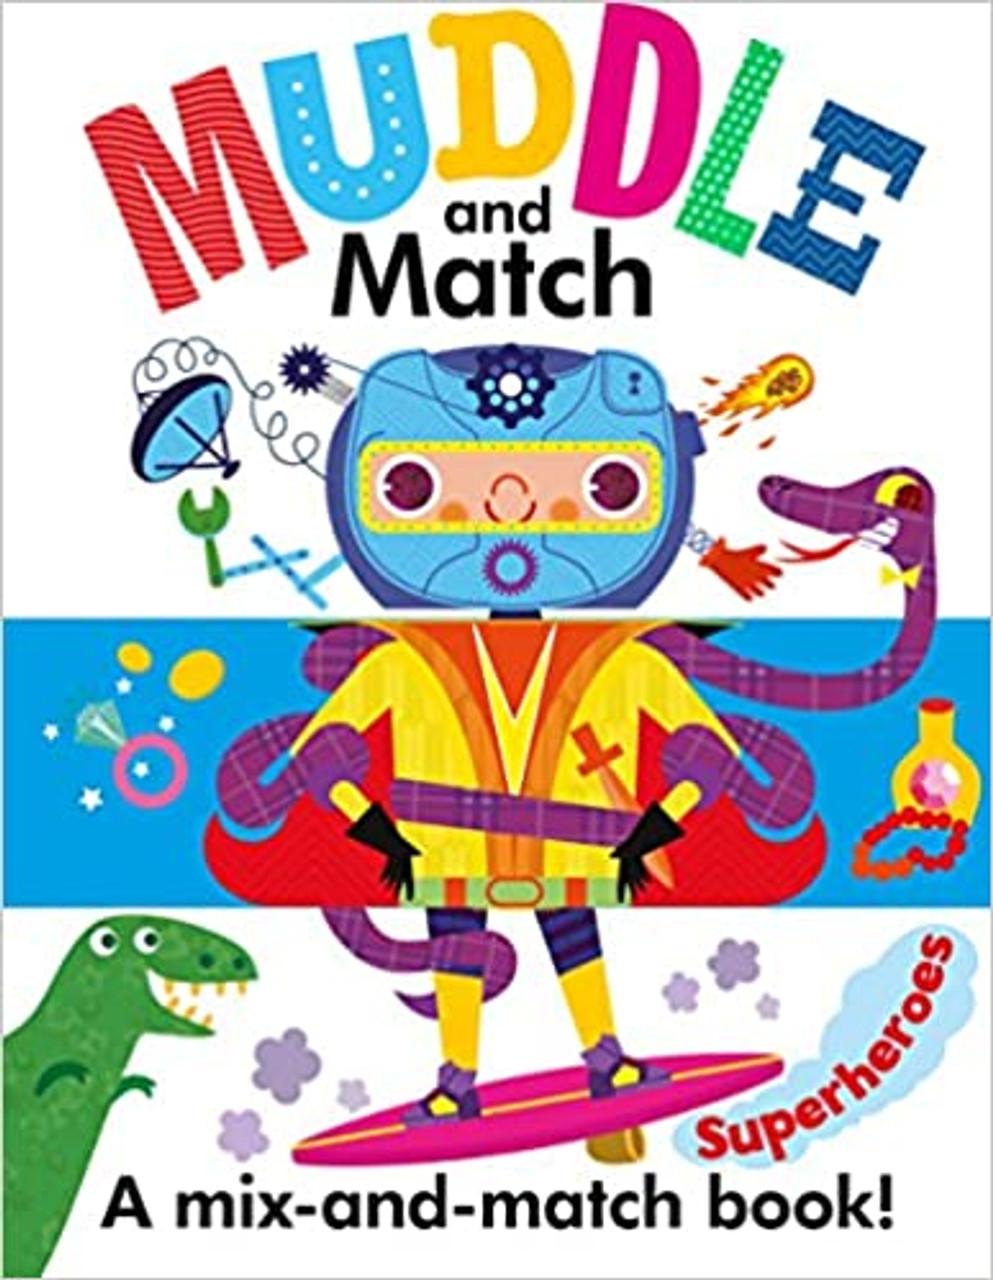 MUDDLE AND MATCH SUPERHEROES BB